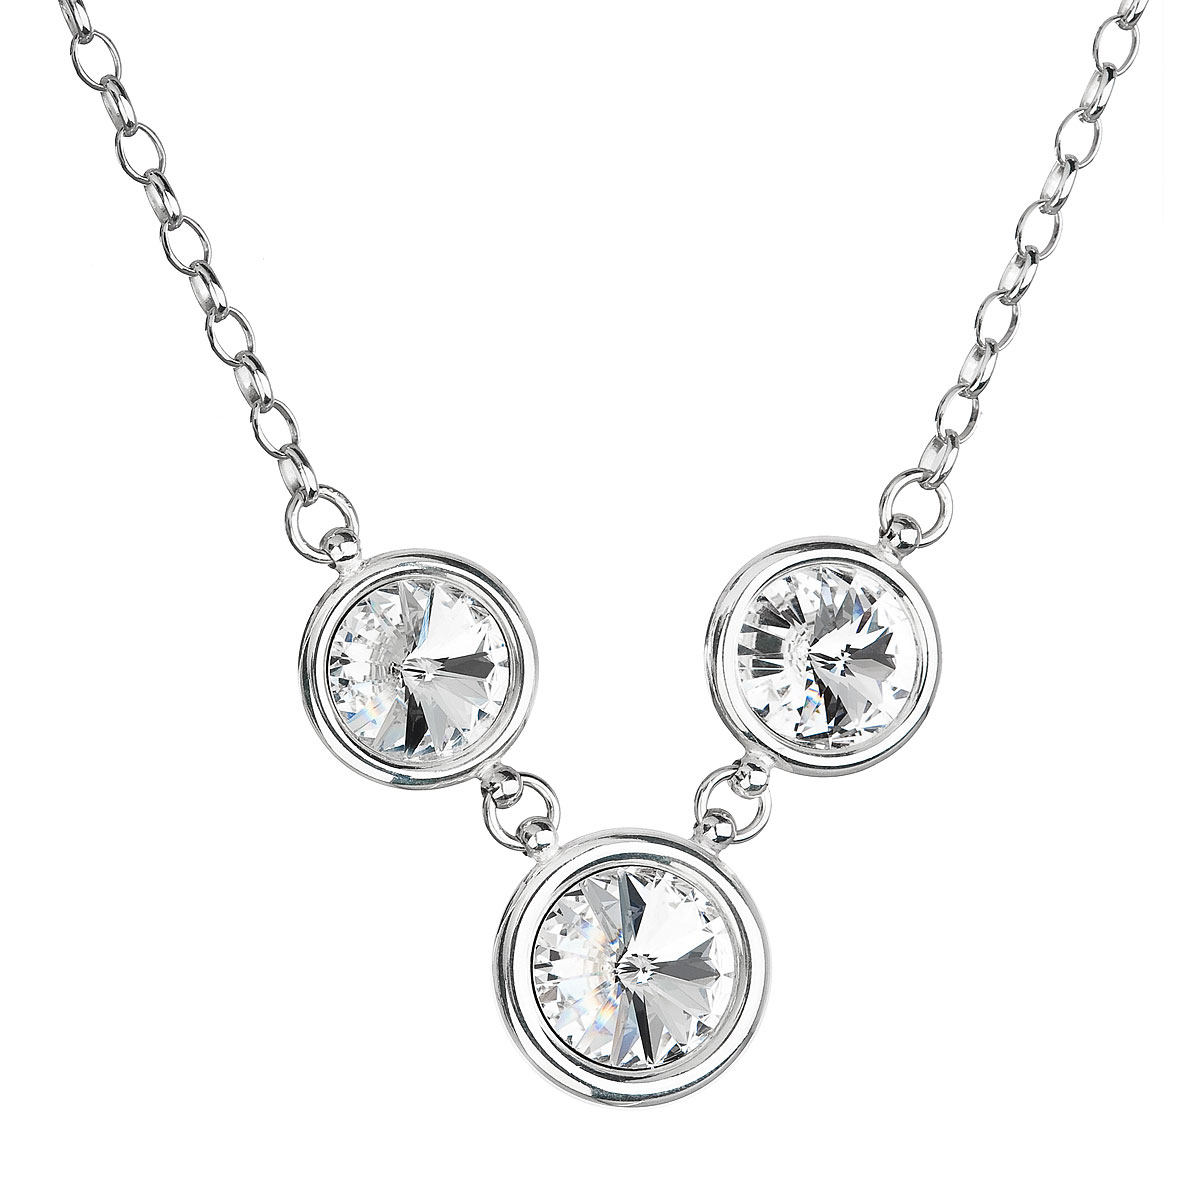 Evolution Group Stříbrný náhrdelník s krystaly Swarovski bílý 32033.1